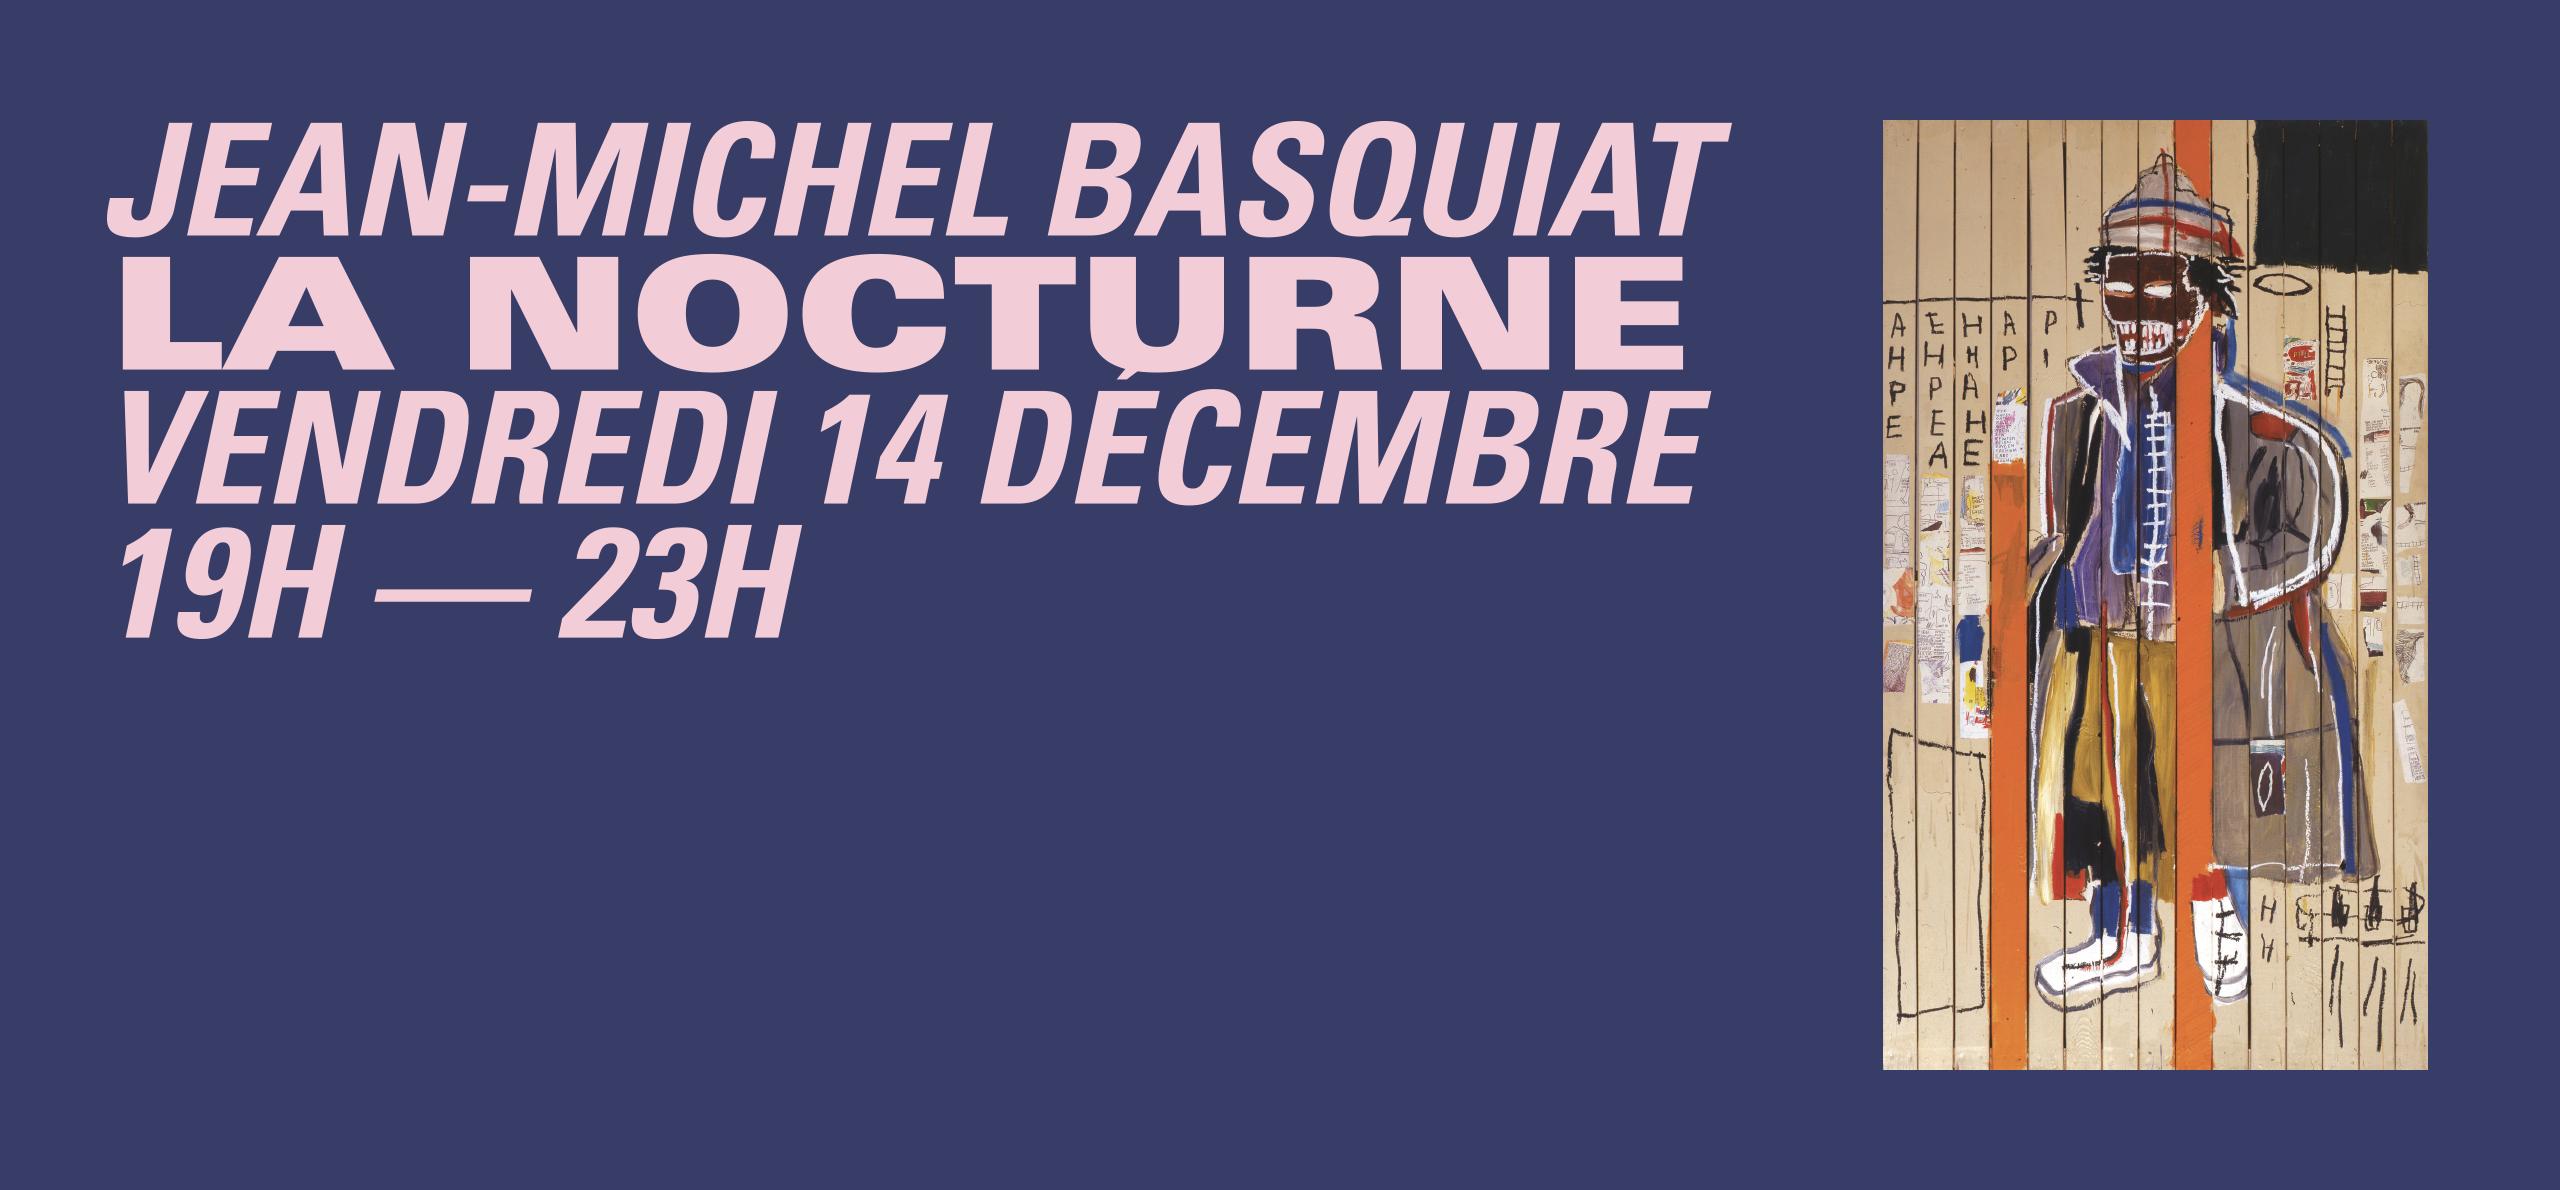 La Nocturne Jean-Michel Basquiat - 14 décembre 2018. Jean-Michel Basquiat, Anthony Clarke, 1985.  © Estate of Jean-Michel Basquiat, licensed by Artestar, New York. London, private collection.